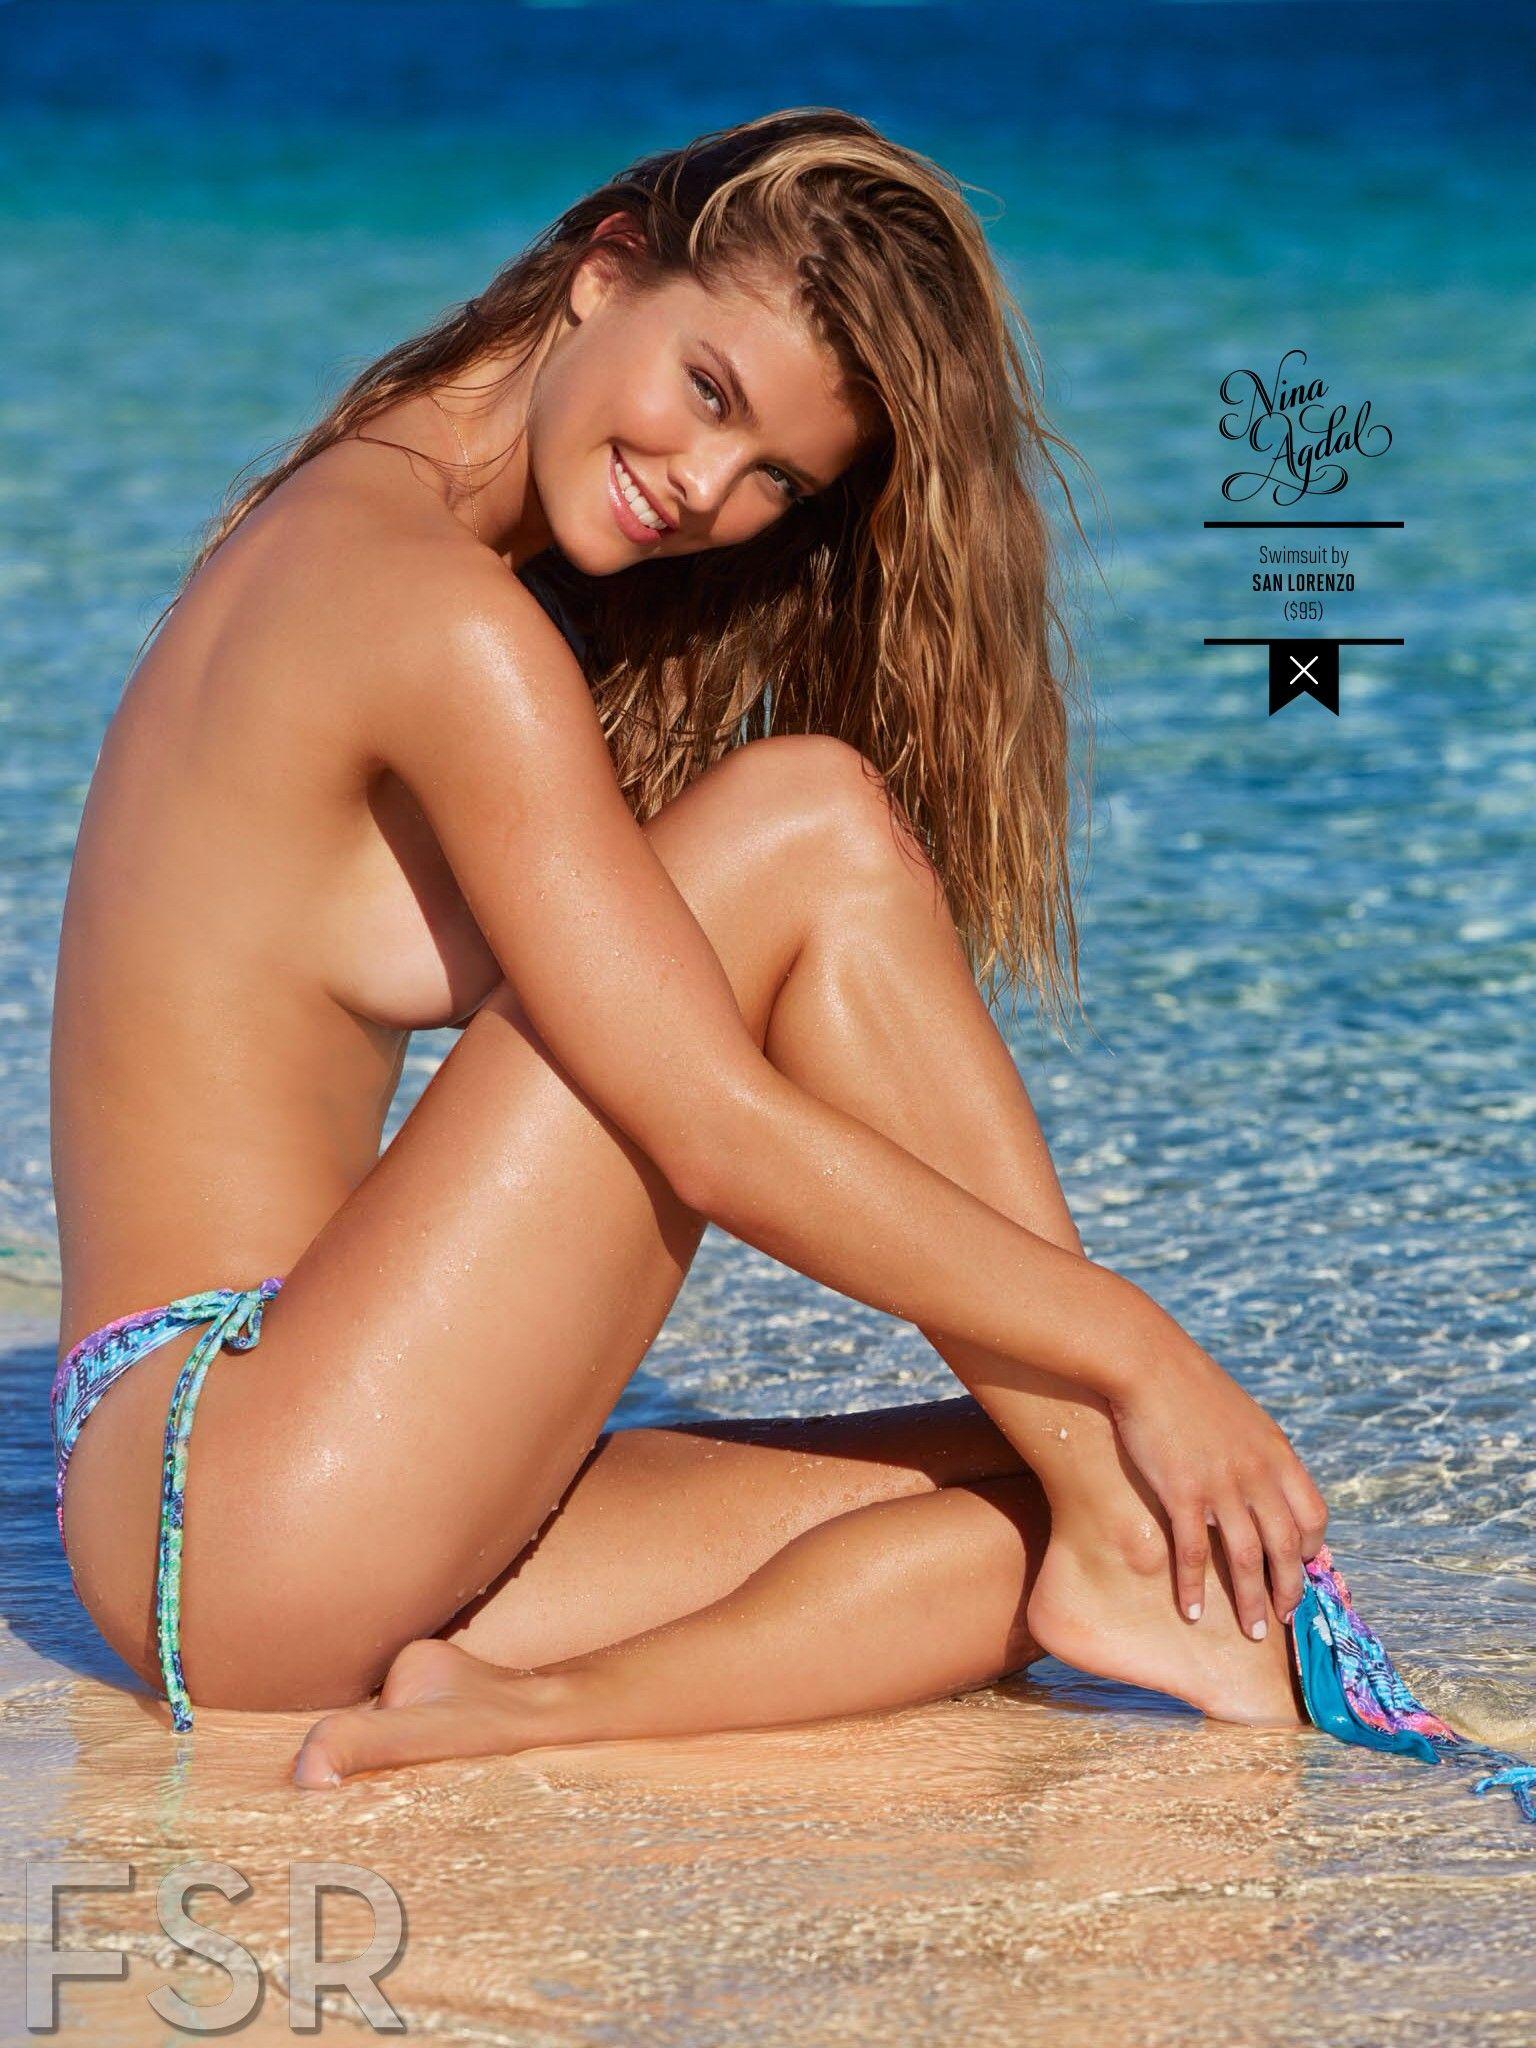 Daring beauty skis in skimpy bikini 15